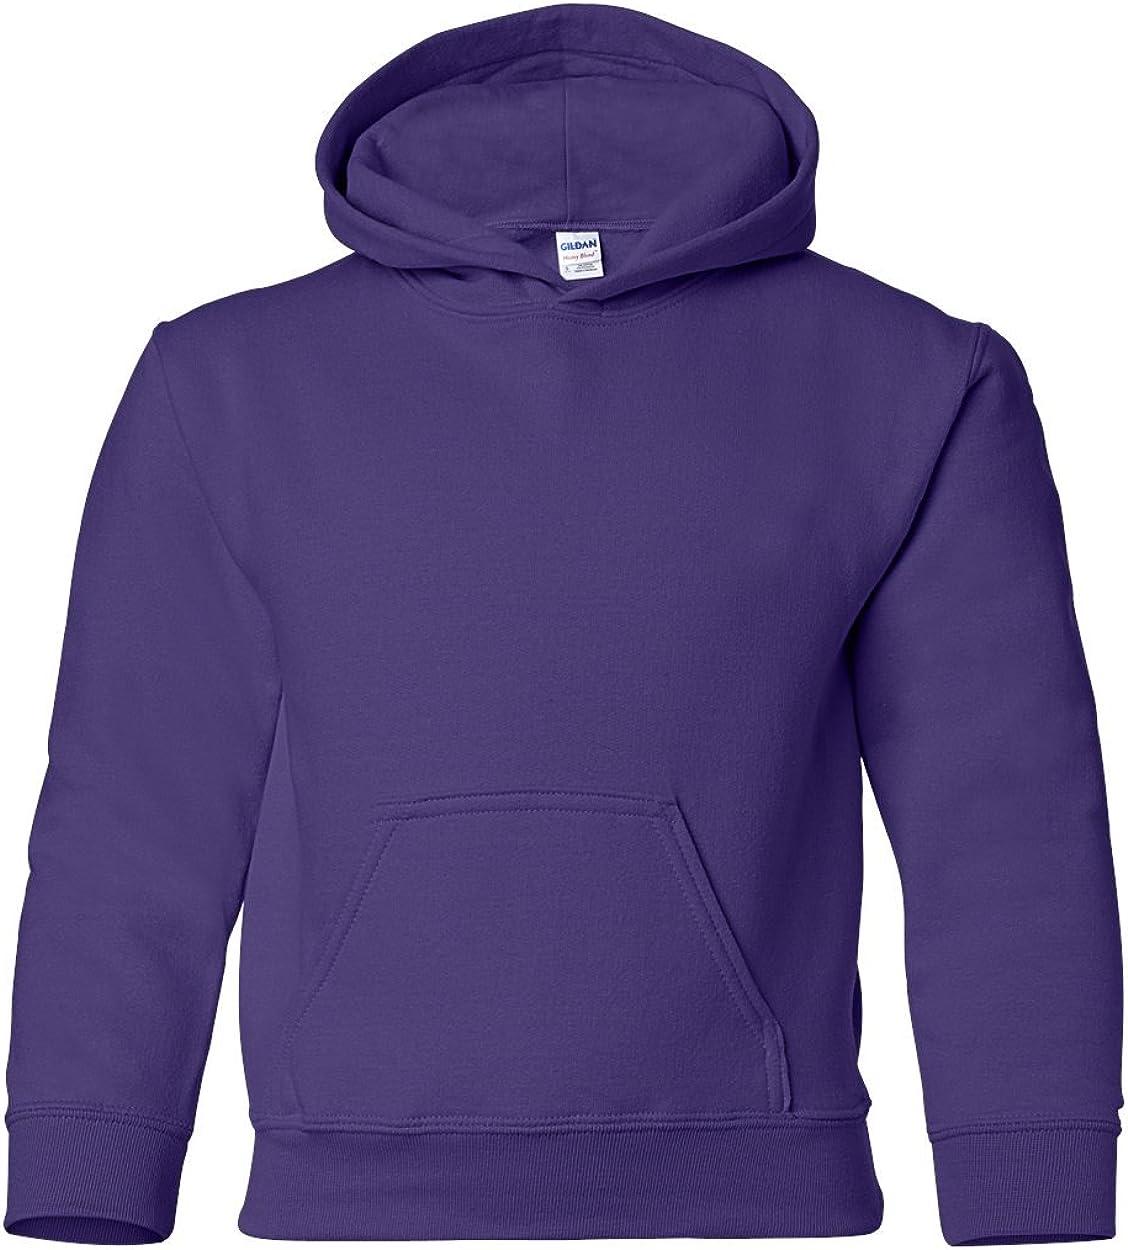 Heavy Blend Hooded Sweatshirt (G185B) Purple, M (Pack of 12)